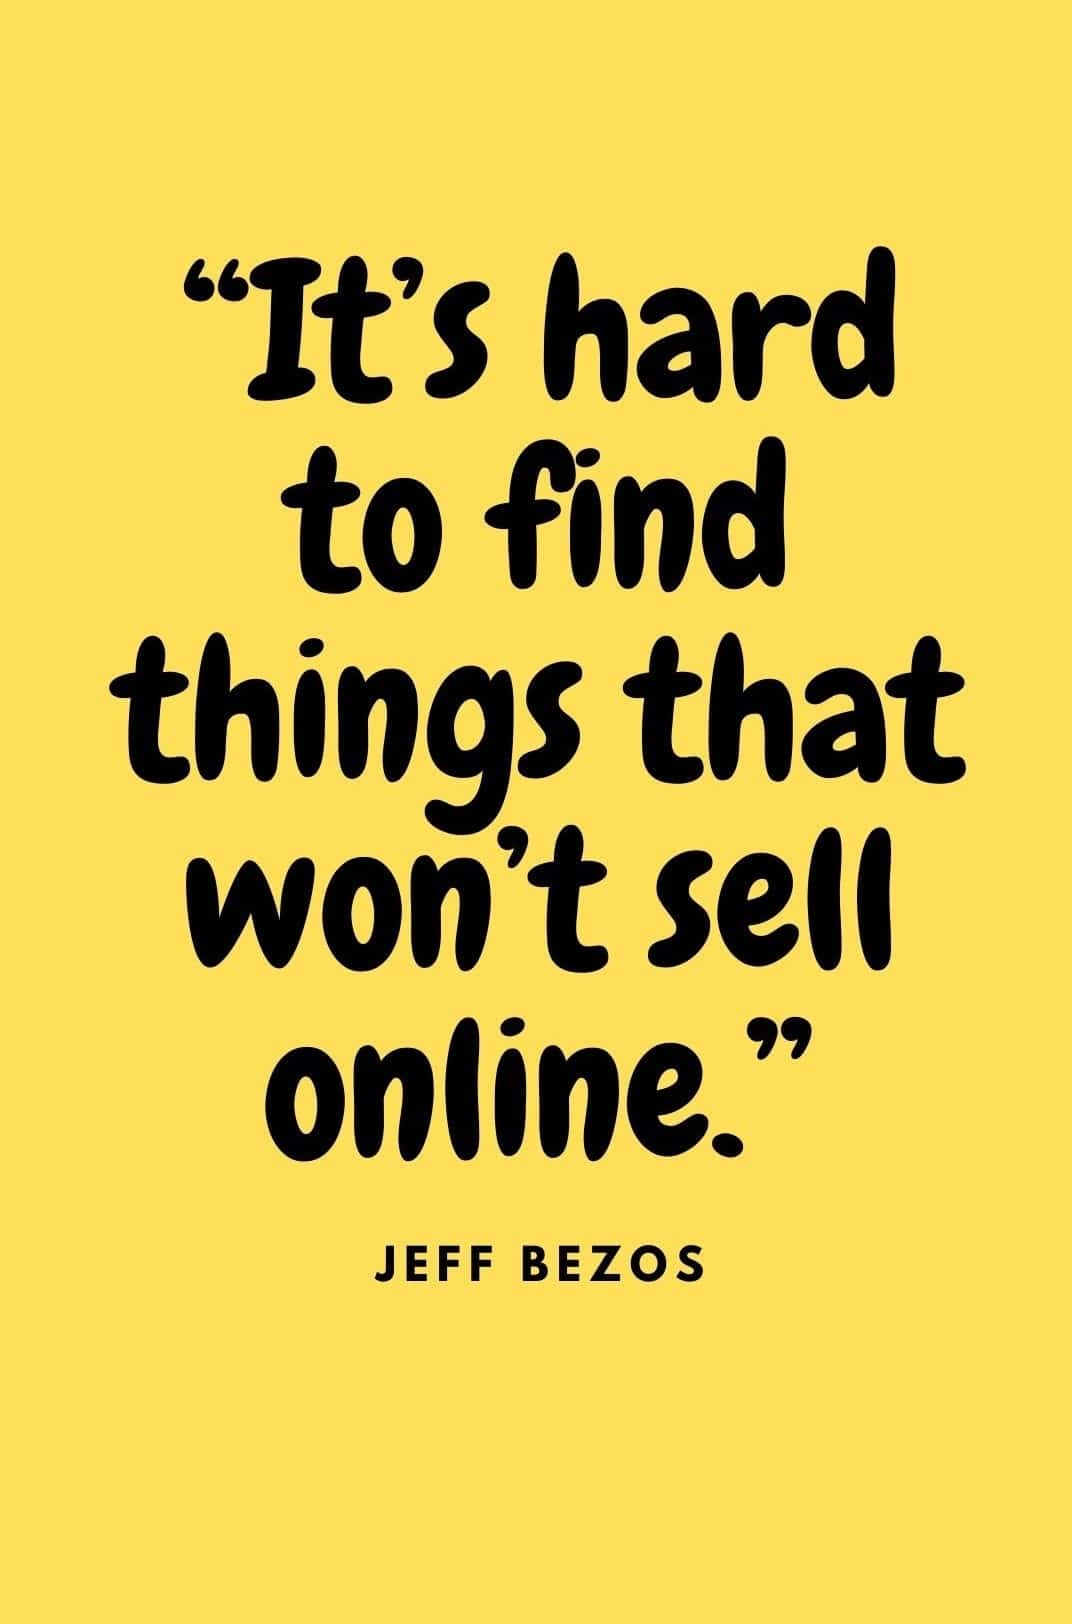 webout digital marketing 4